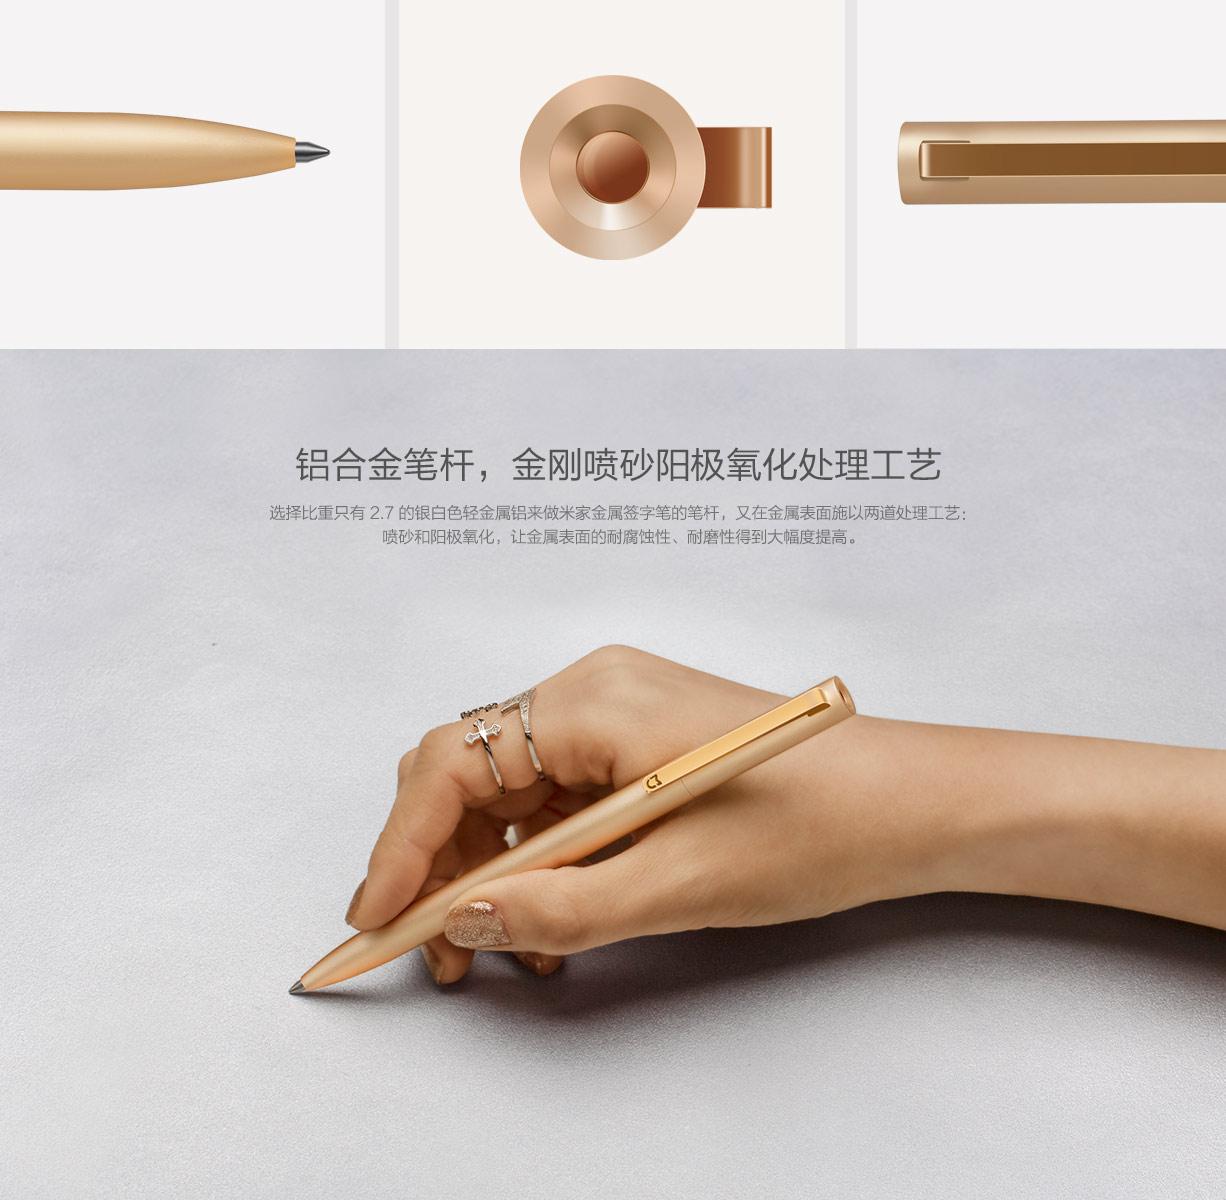 mi pen 2.jpg